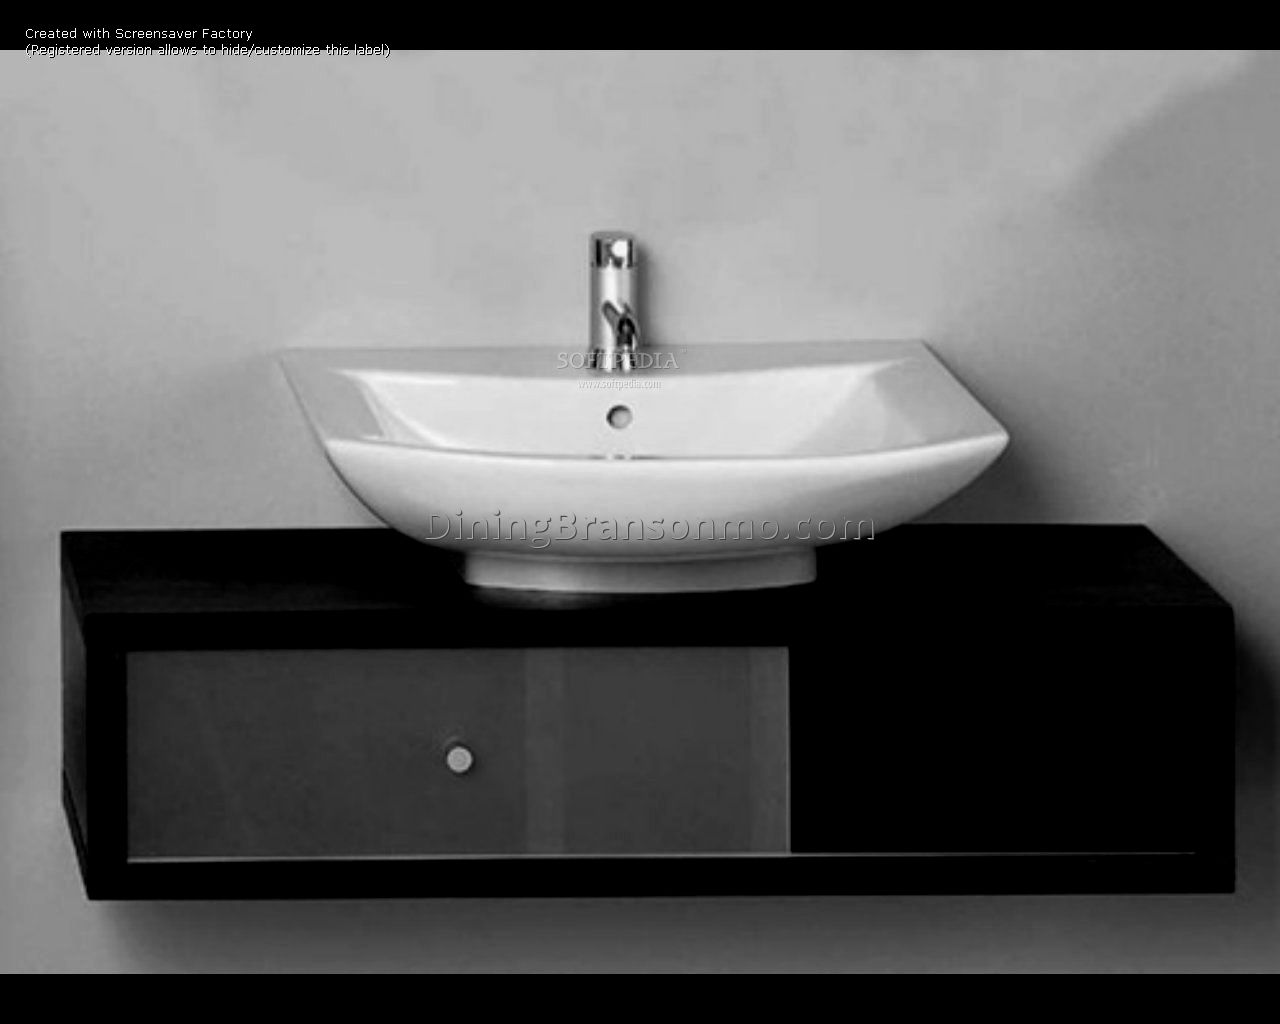 best of copper bathroom sinks model-Fresh Copper Bathroom Sinks Wallpaper